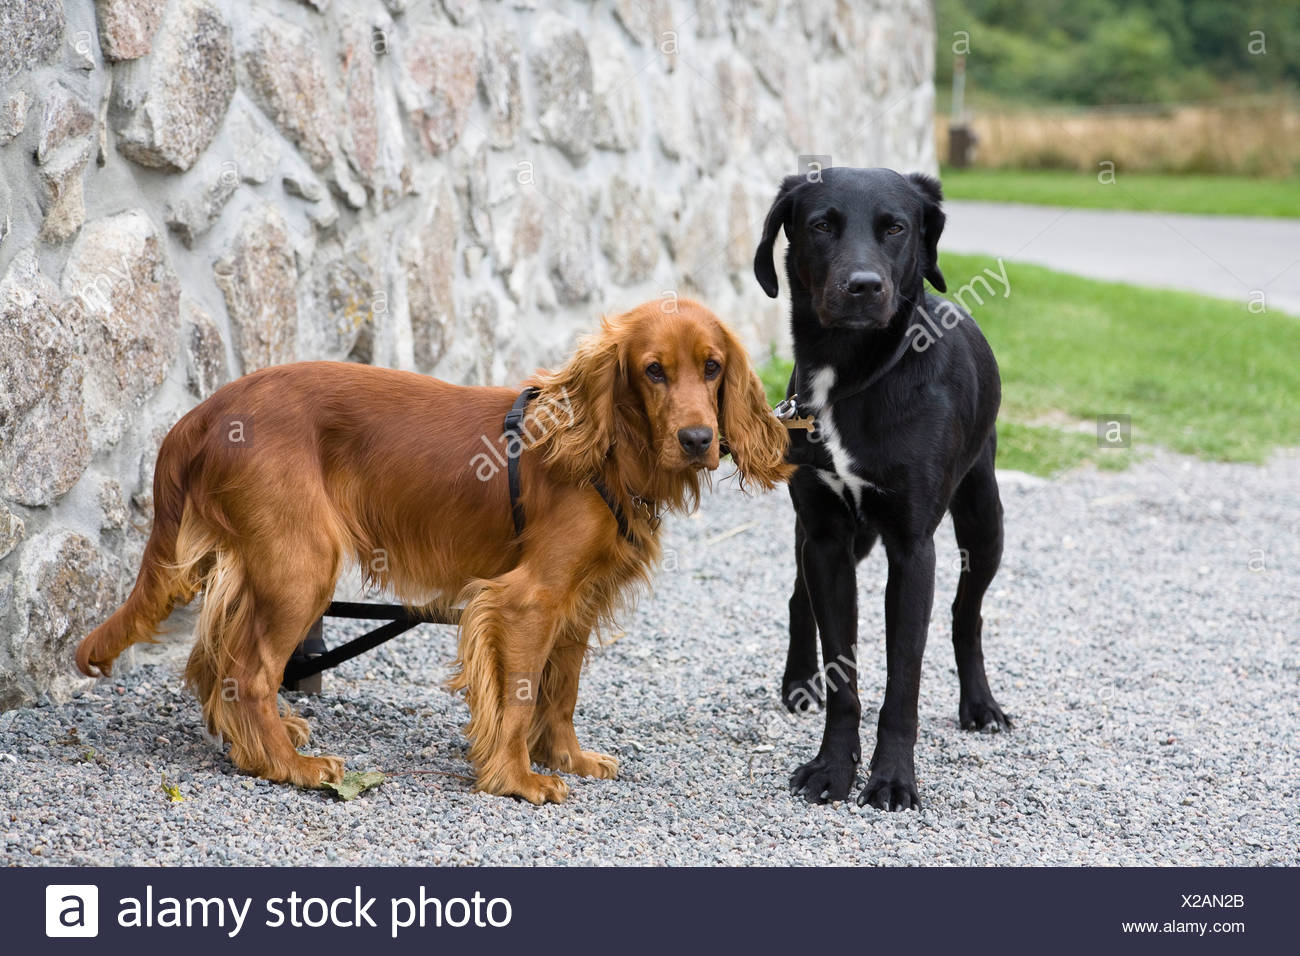 Pet dogs, black Labrador and Cocker Spaniel, Bornholm, Denmark - Stock Image